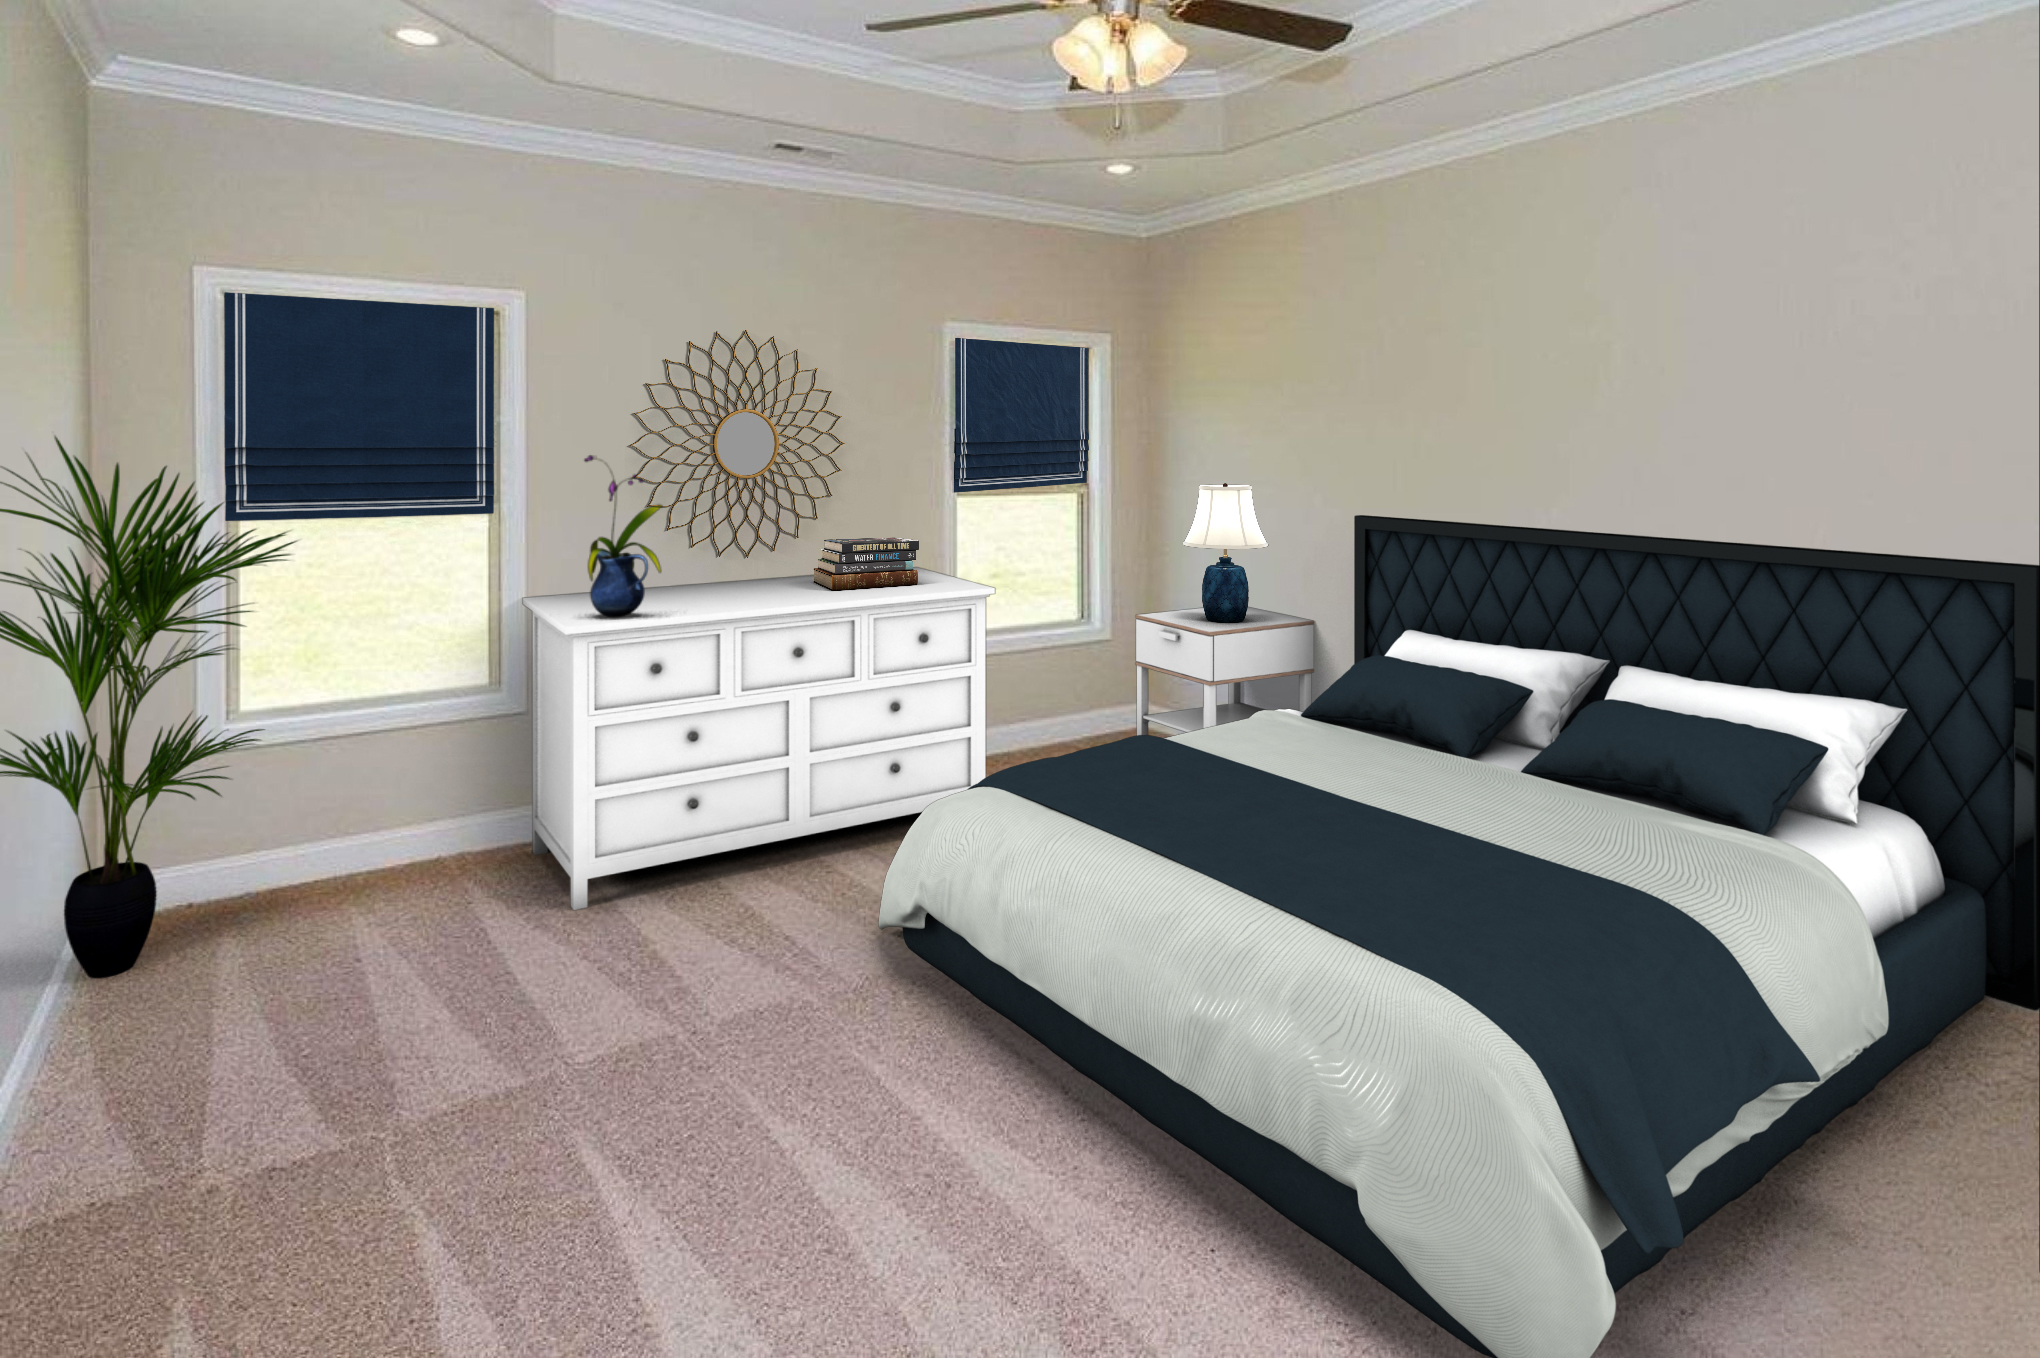 Bedroom 1 - Scene 5 - Standard